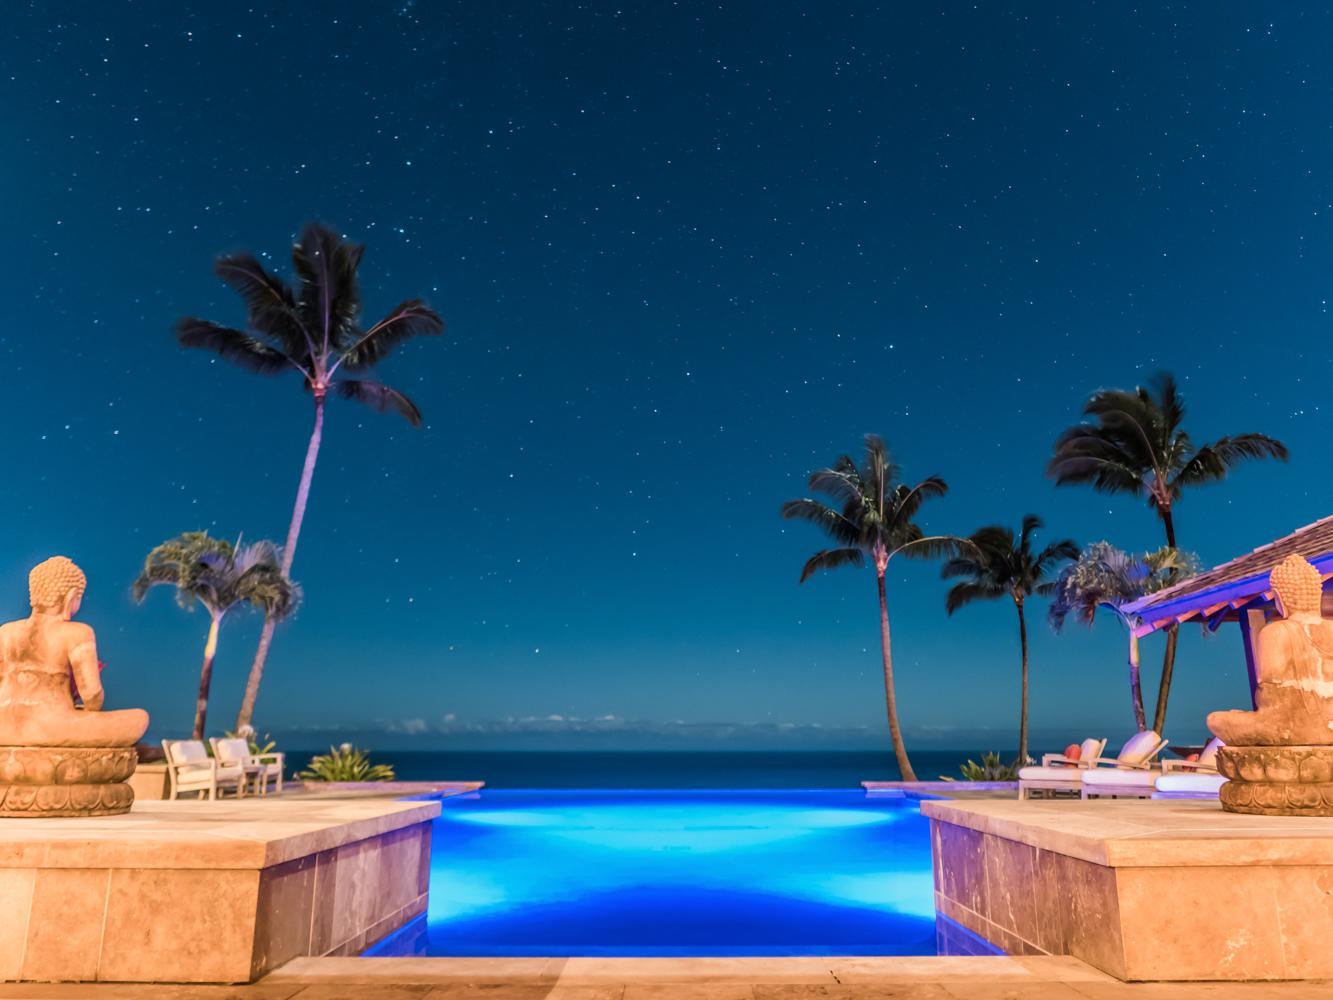 house ext night pool stars timelapse 1_1.jpg